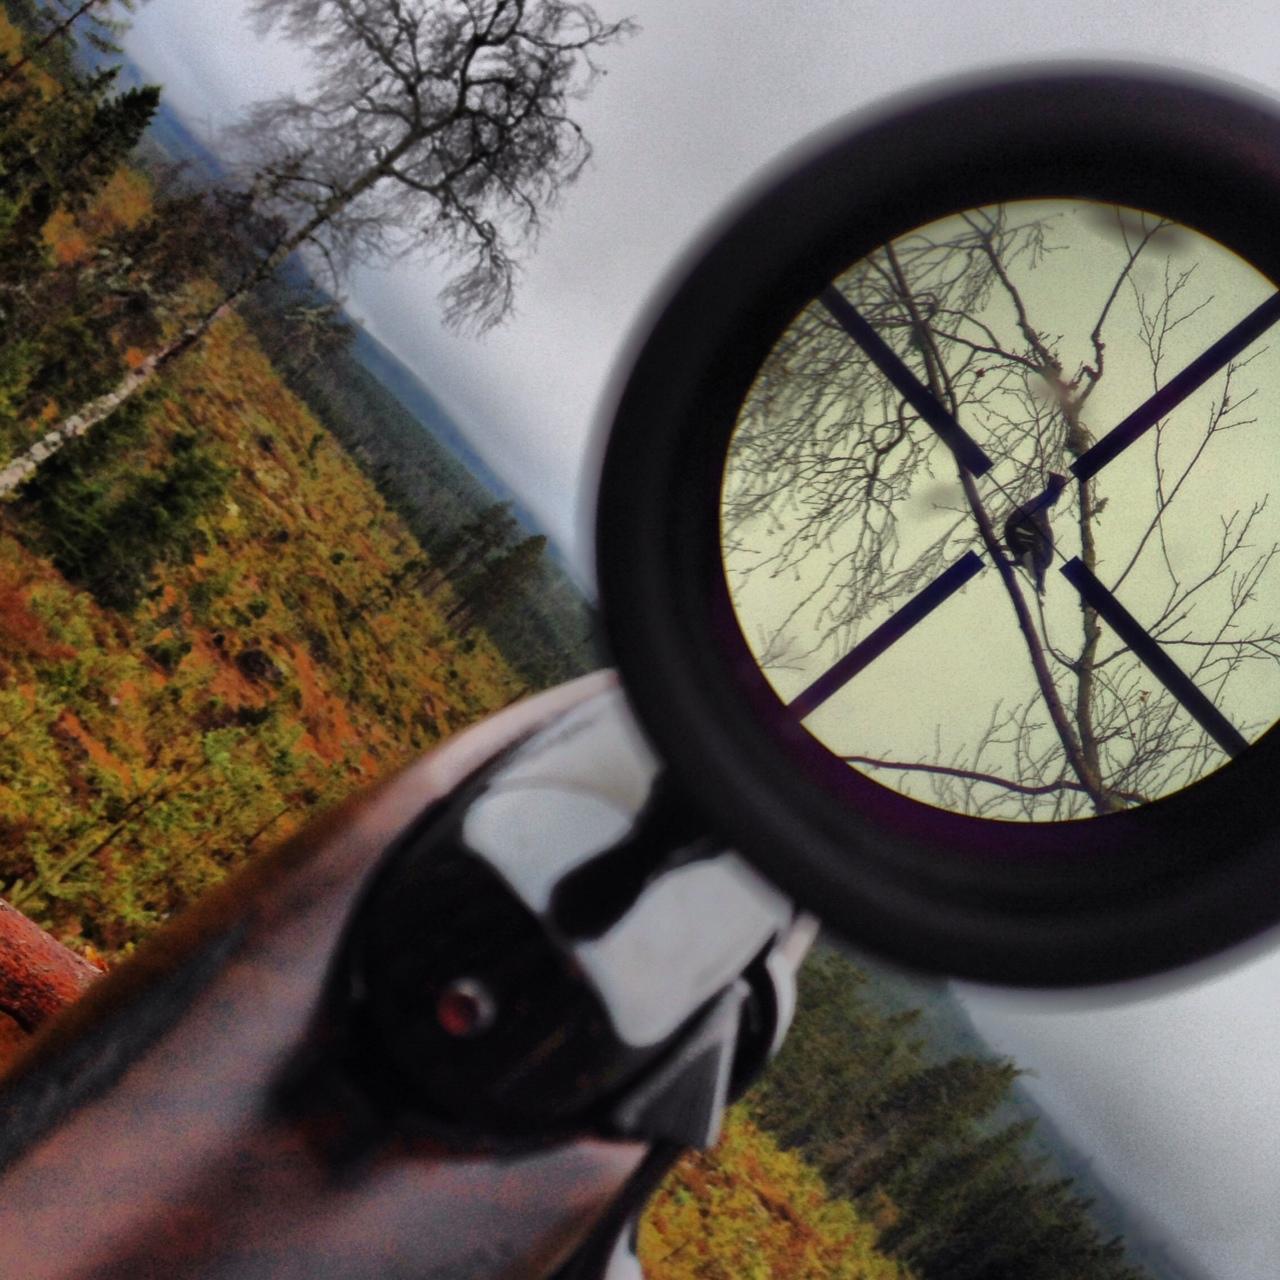 Jonas hunting experience, Scandinavian Mountains, Jonas i Sälen, hunt, hunting